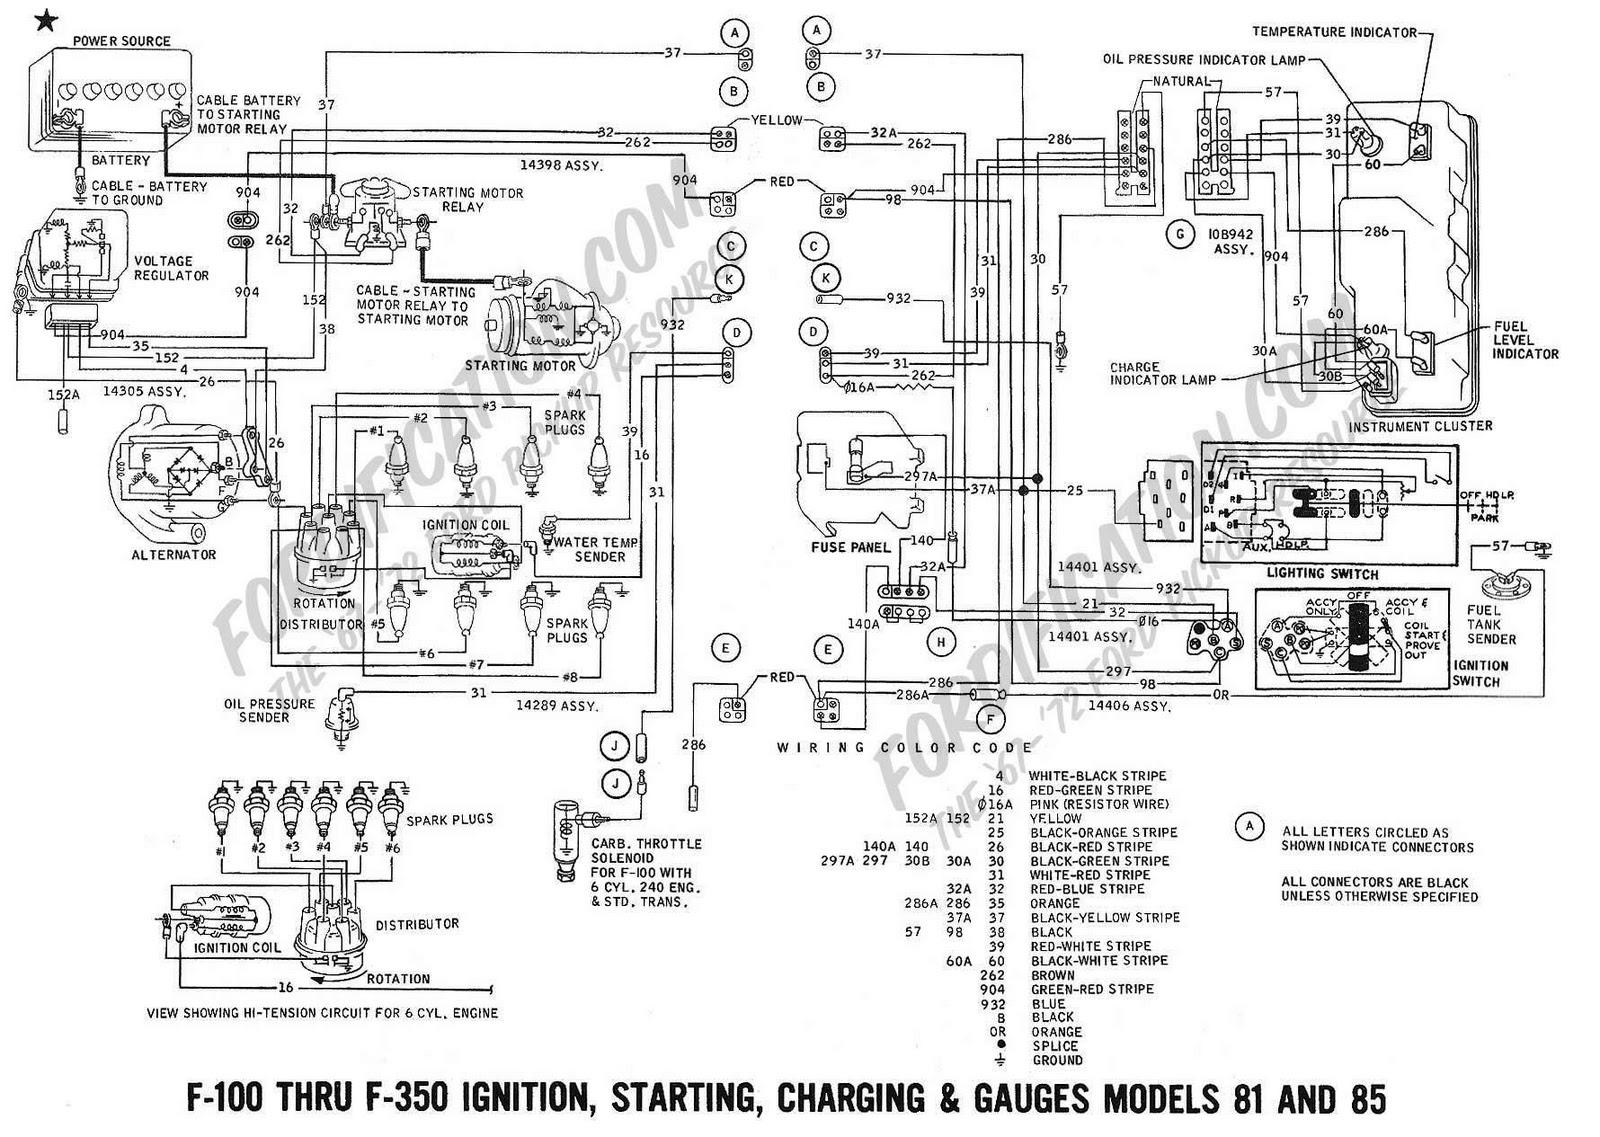 Fine Mercedes Sprinter Wiring Diagram Composition - Best Images for ...